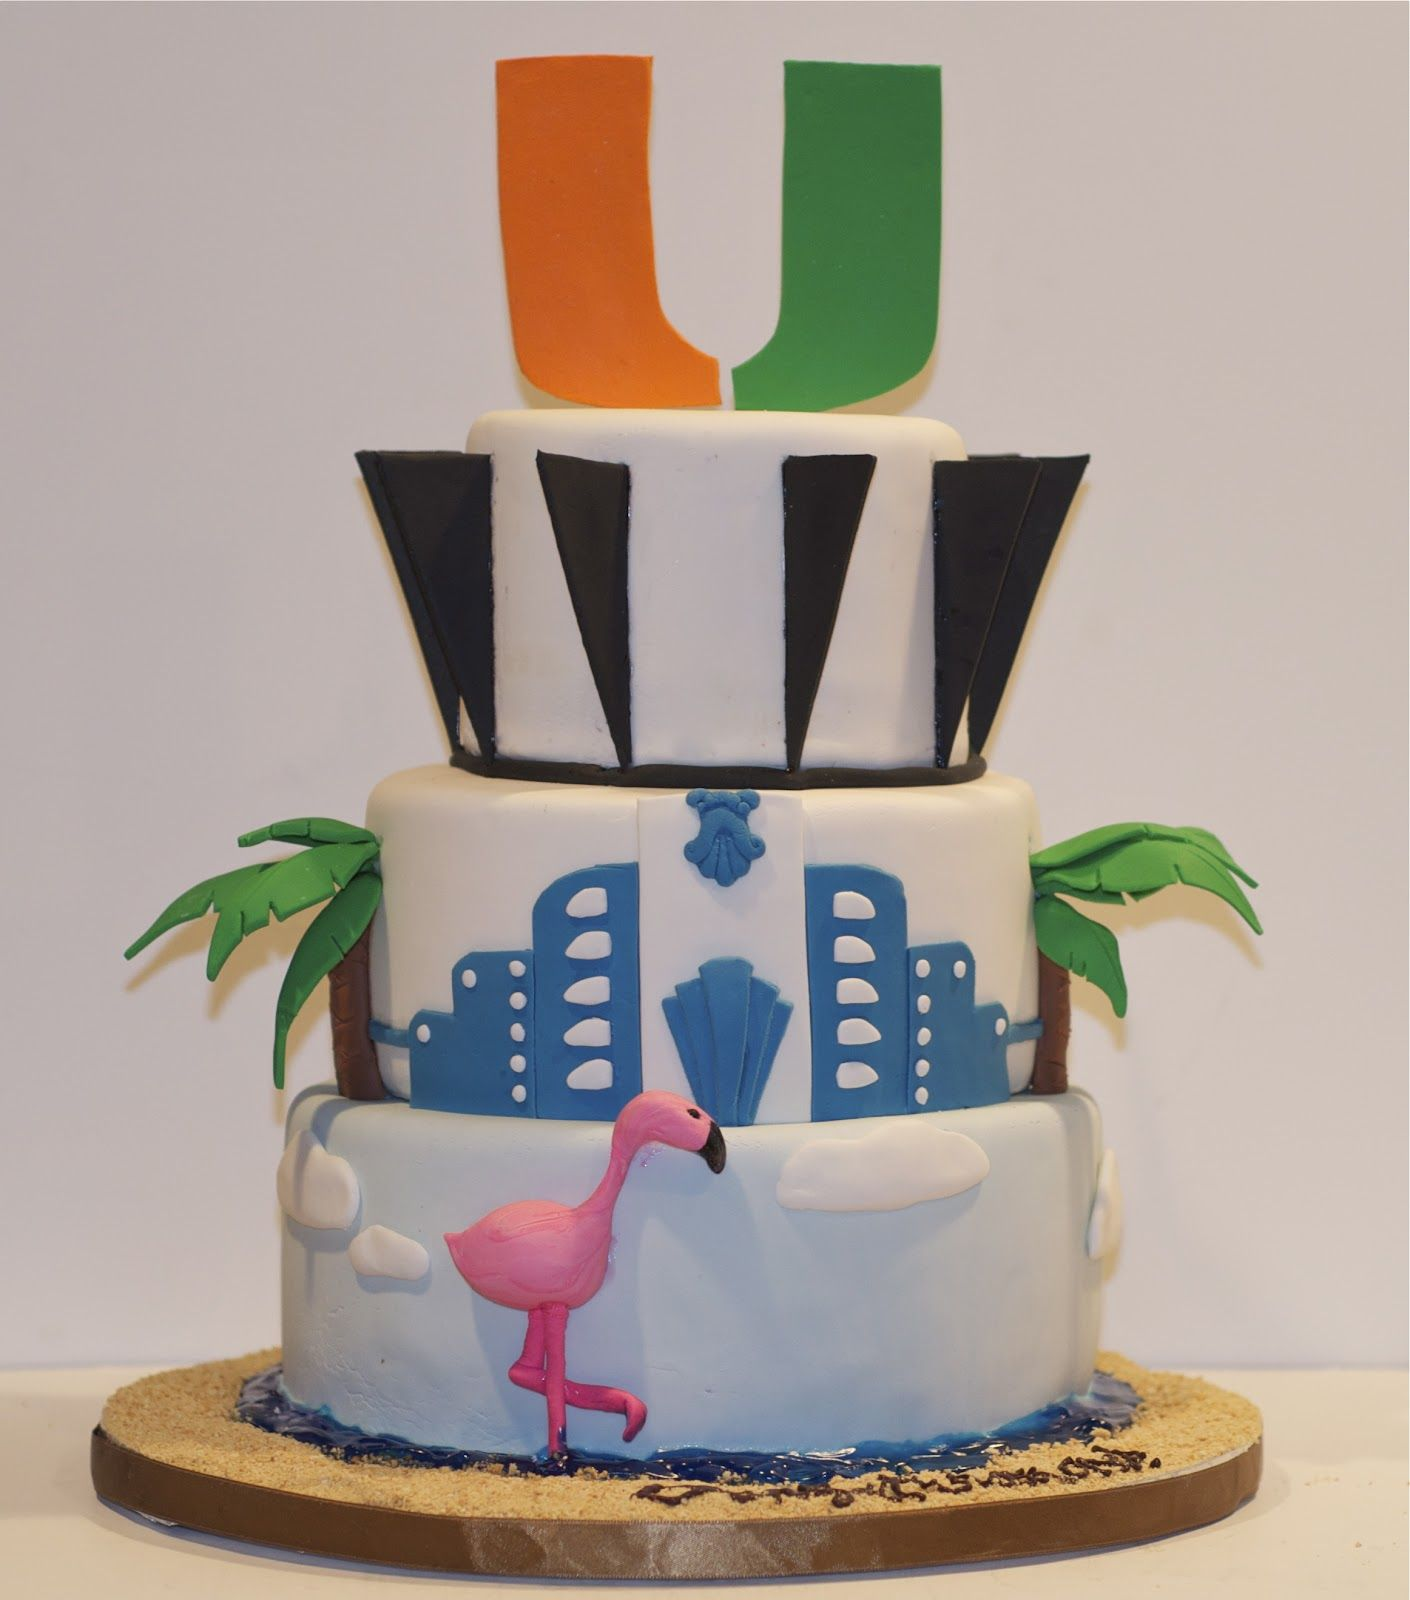 Peachy Graduation Cake University Of Miami With Images Cake Funny Birthday Cards Online Hendilapandamsfinfo